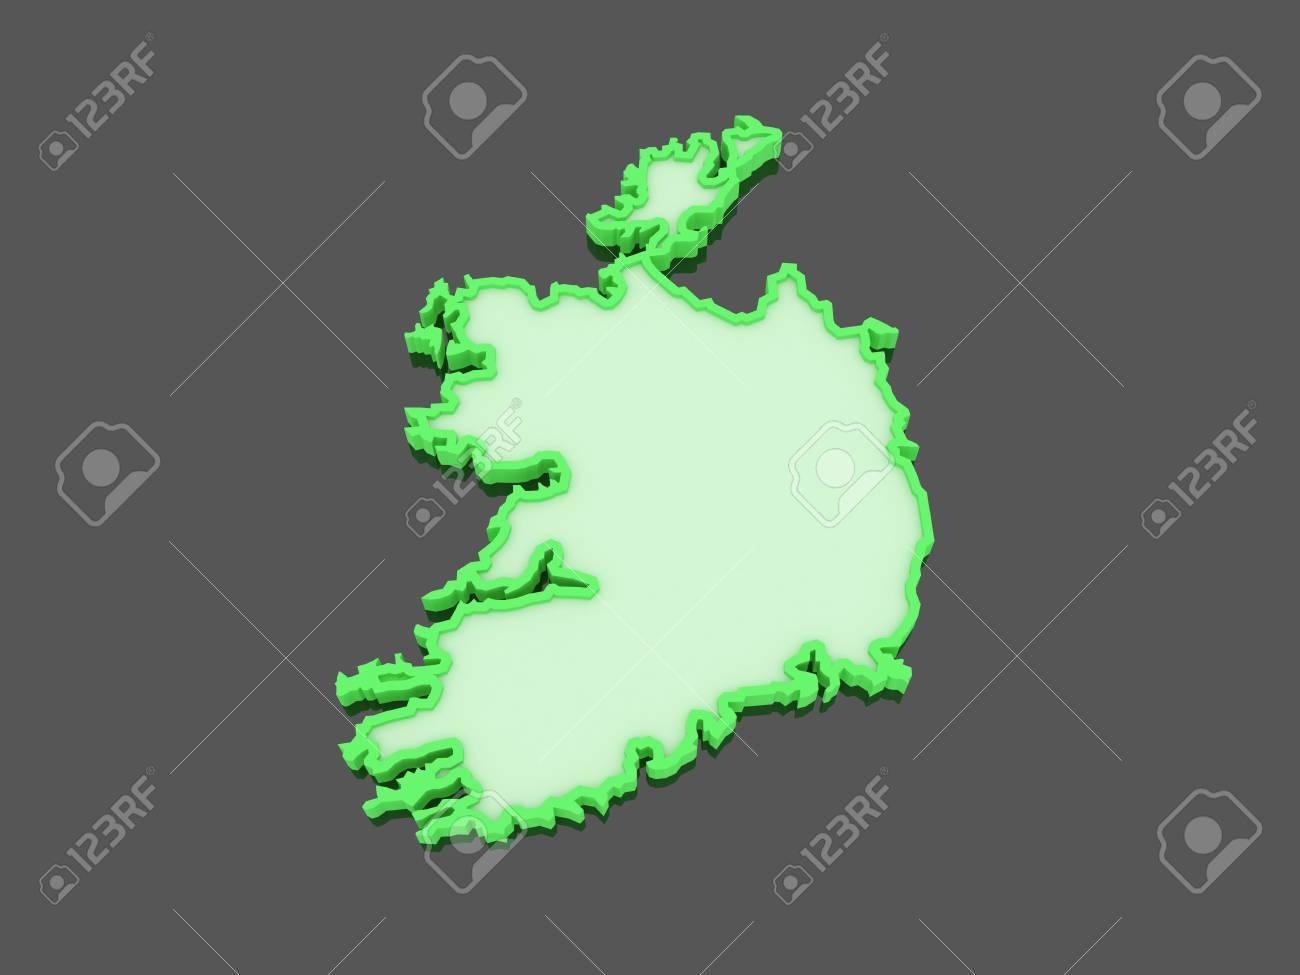 Map Of Ireland 3d.Map Of Ireland 3d